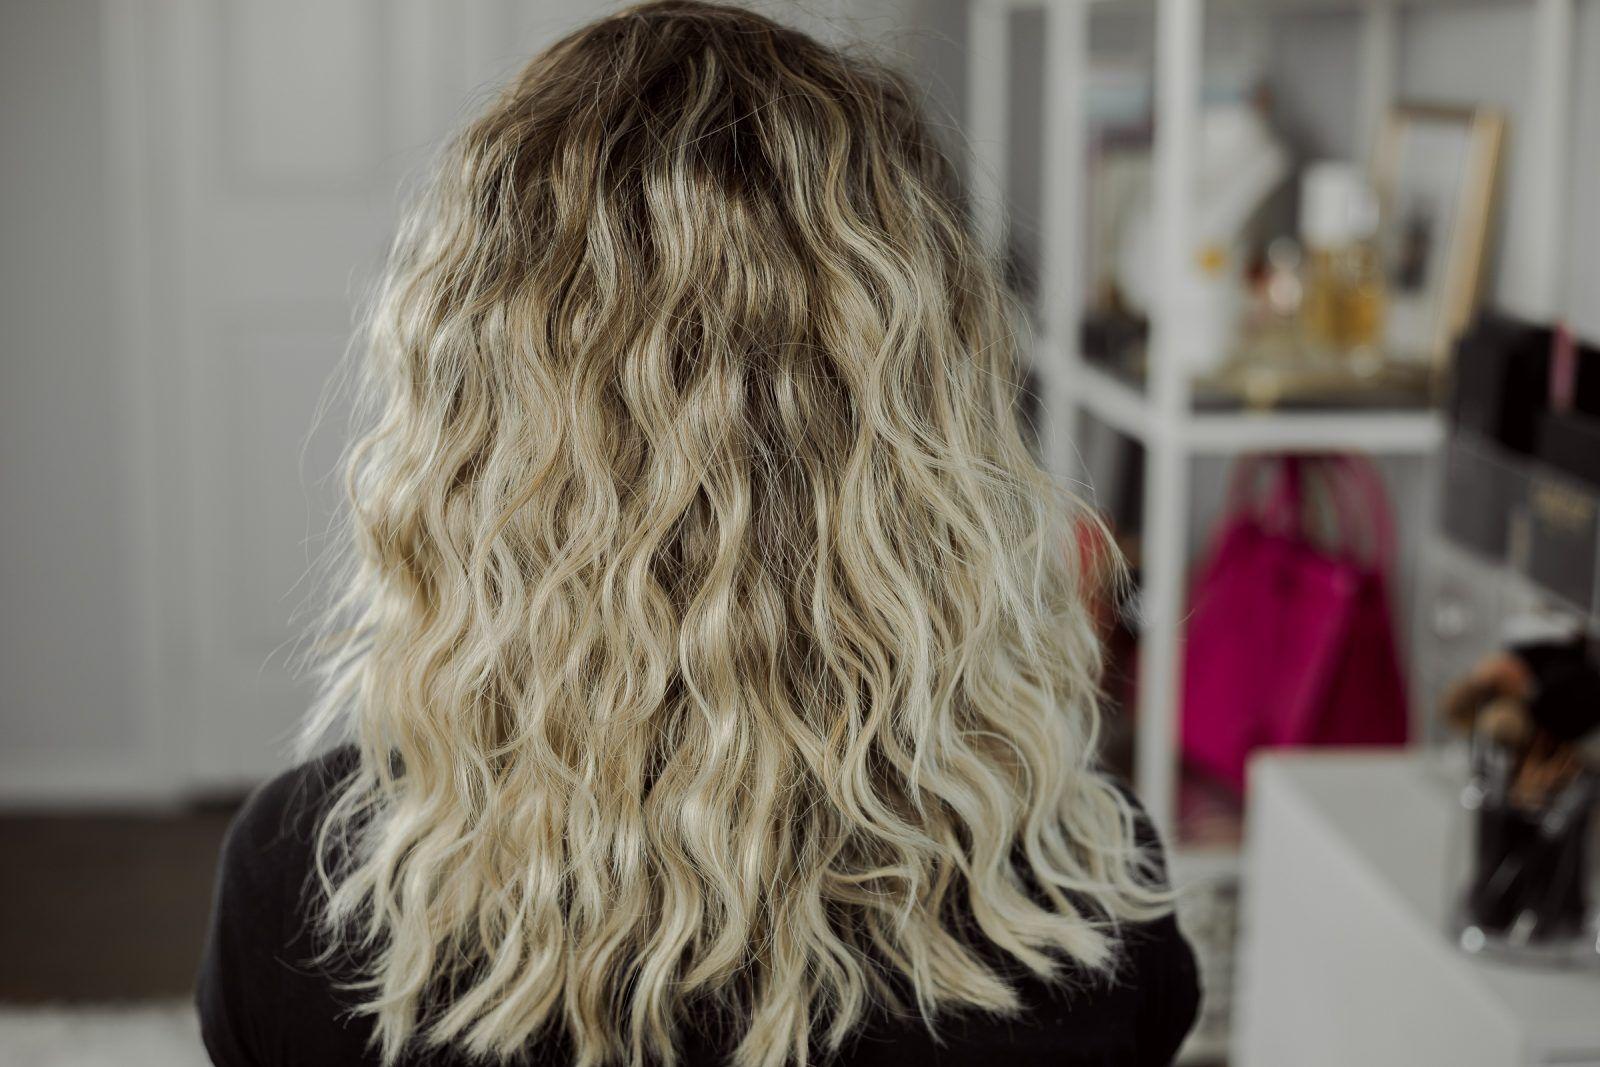 How To Use The Revlon Jumbo 3 Barrel Hair Waver Hair Waver Beachy Waves Hair Long Hair Waves